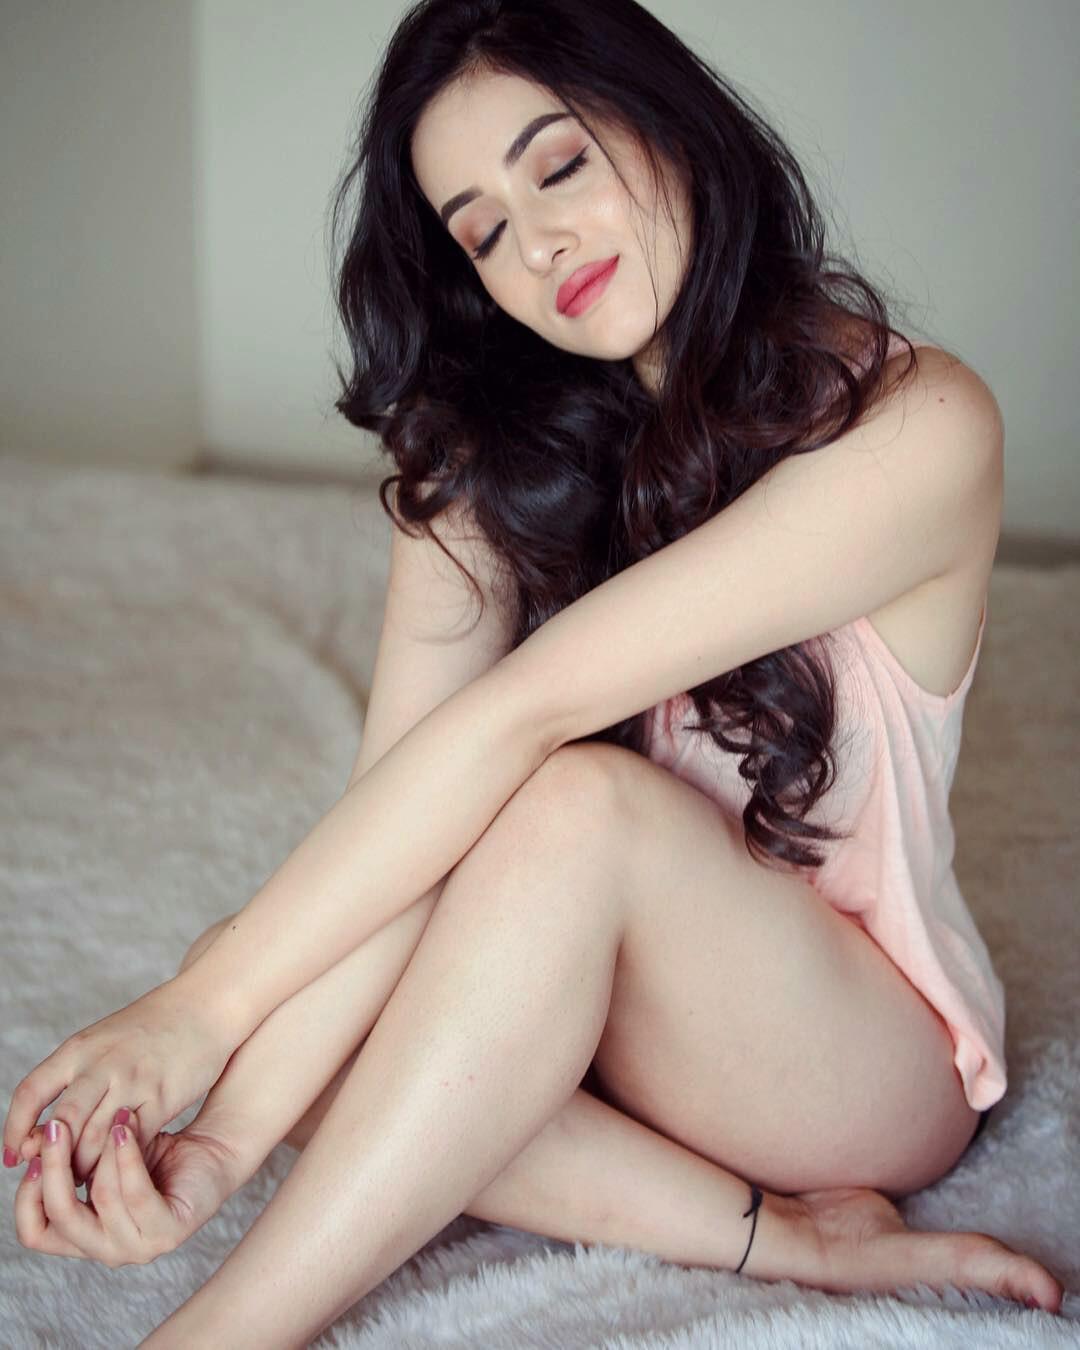 Aditi Budhathoki Hot Bikini Photoshoot Images Hd